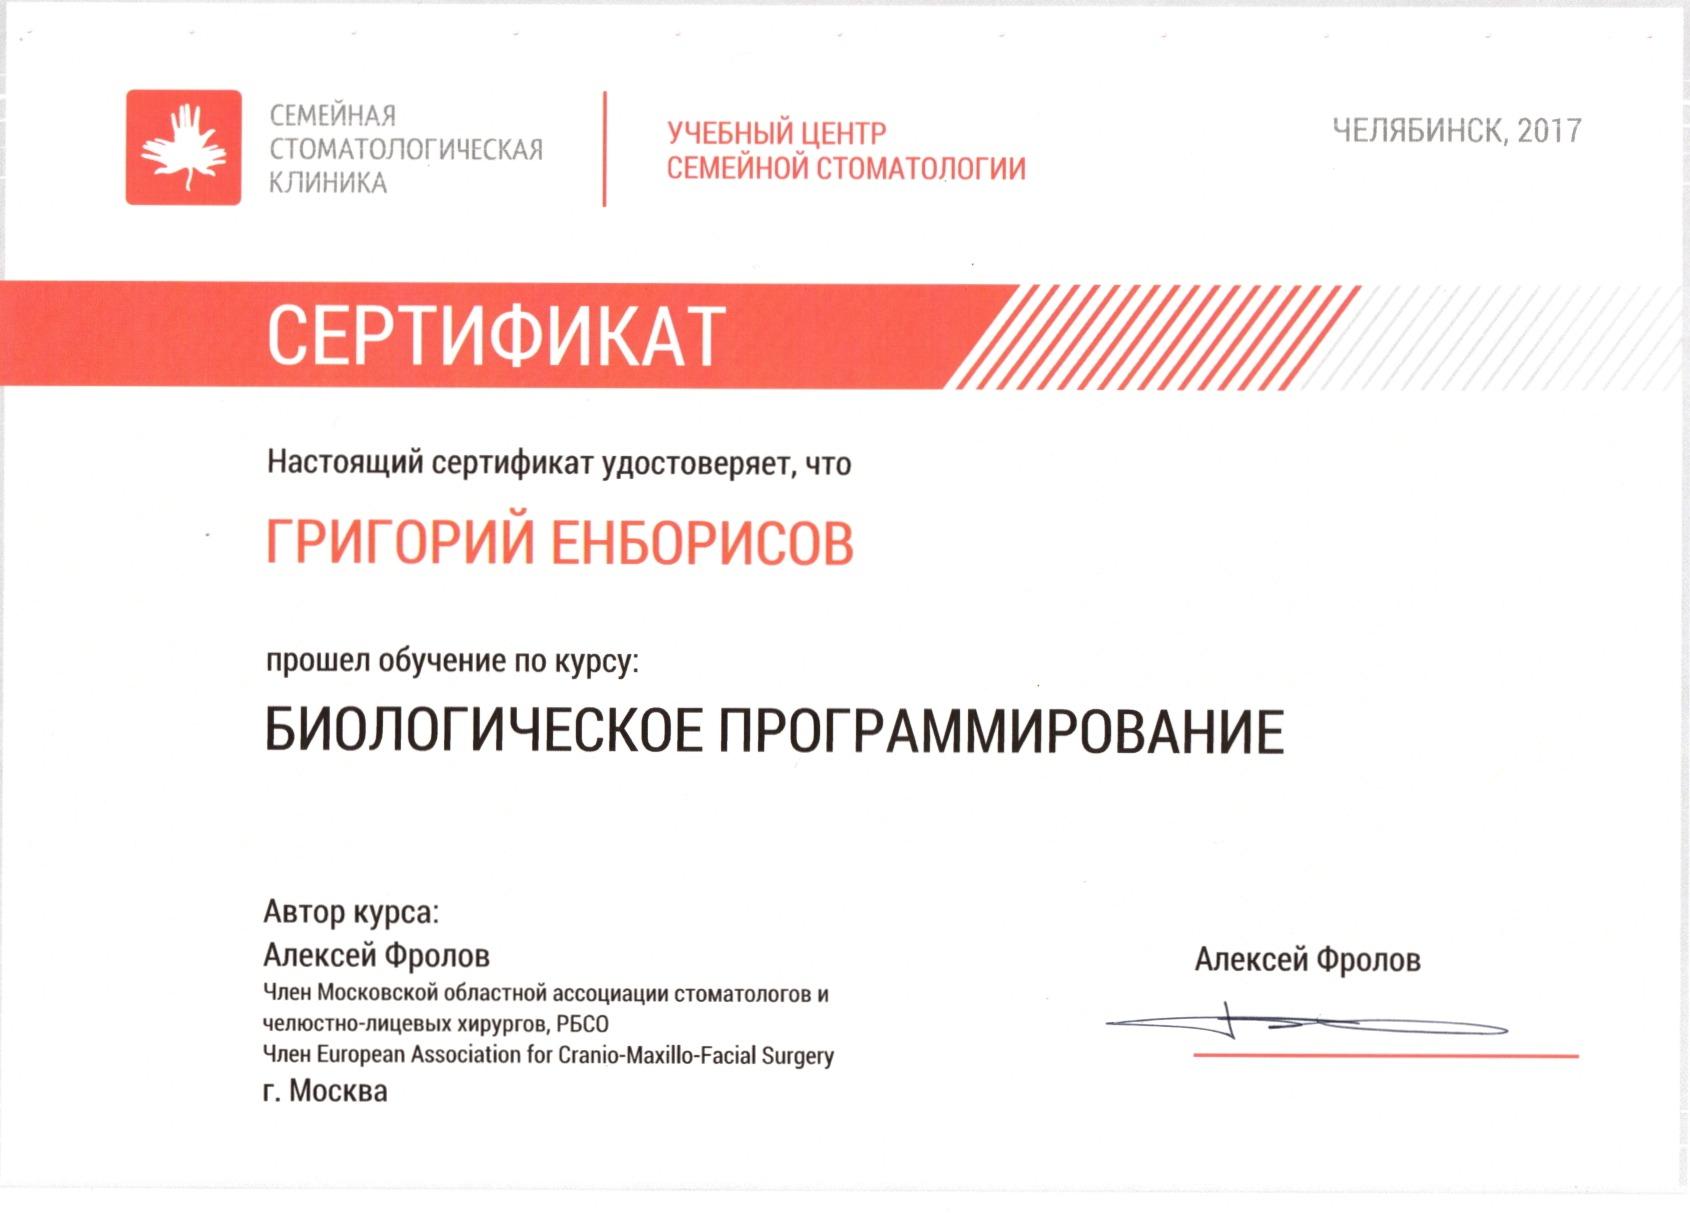 Енборисов Григорий Андреевич